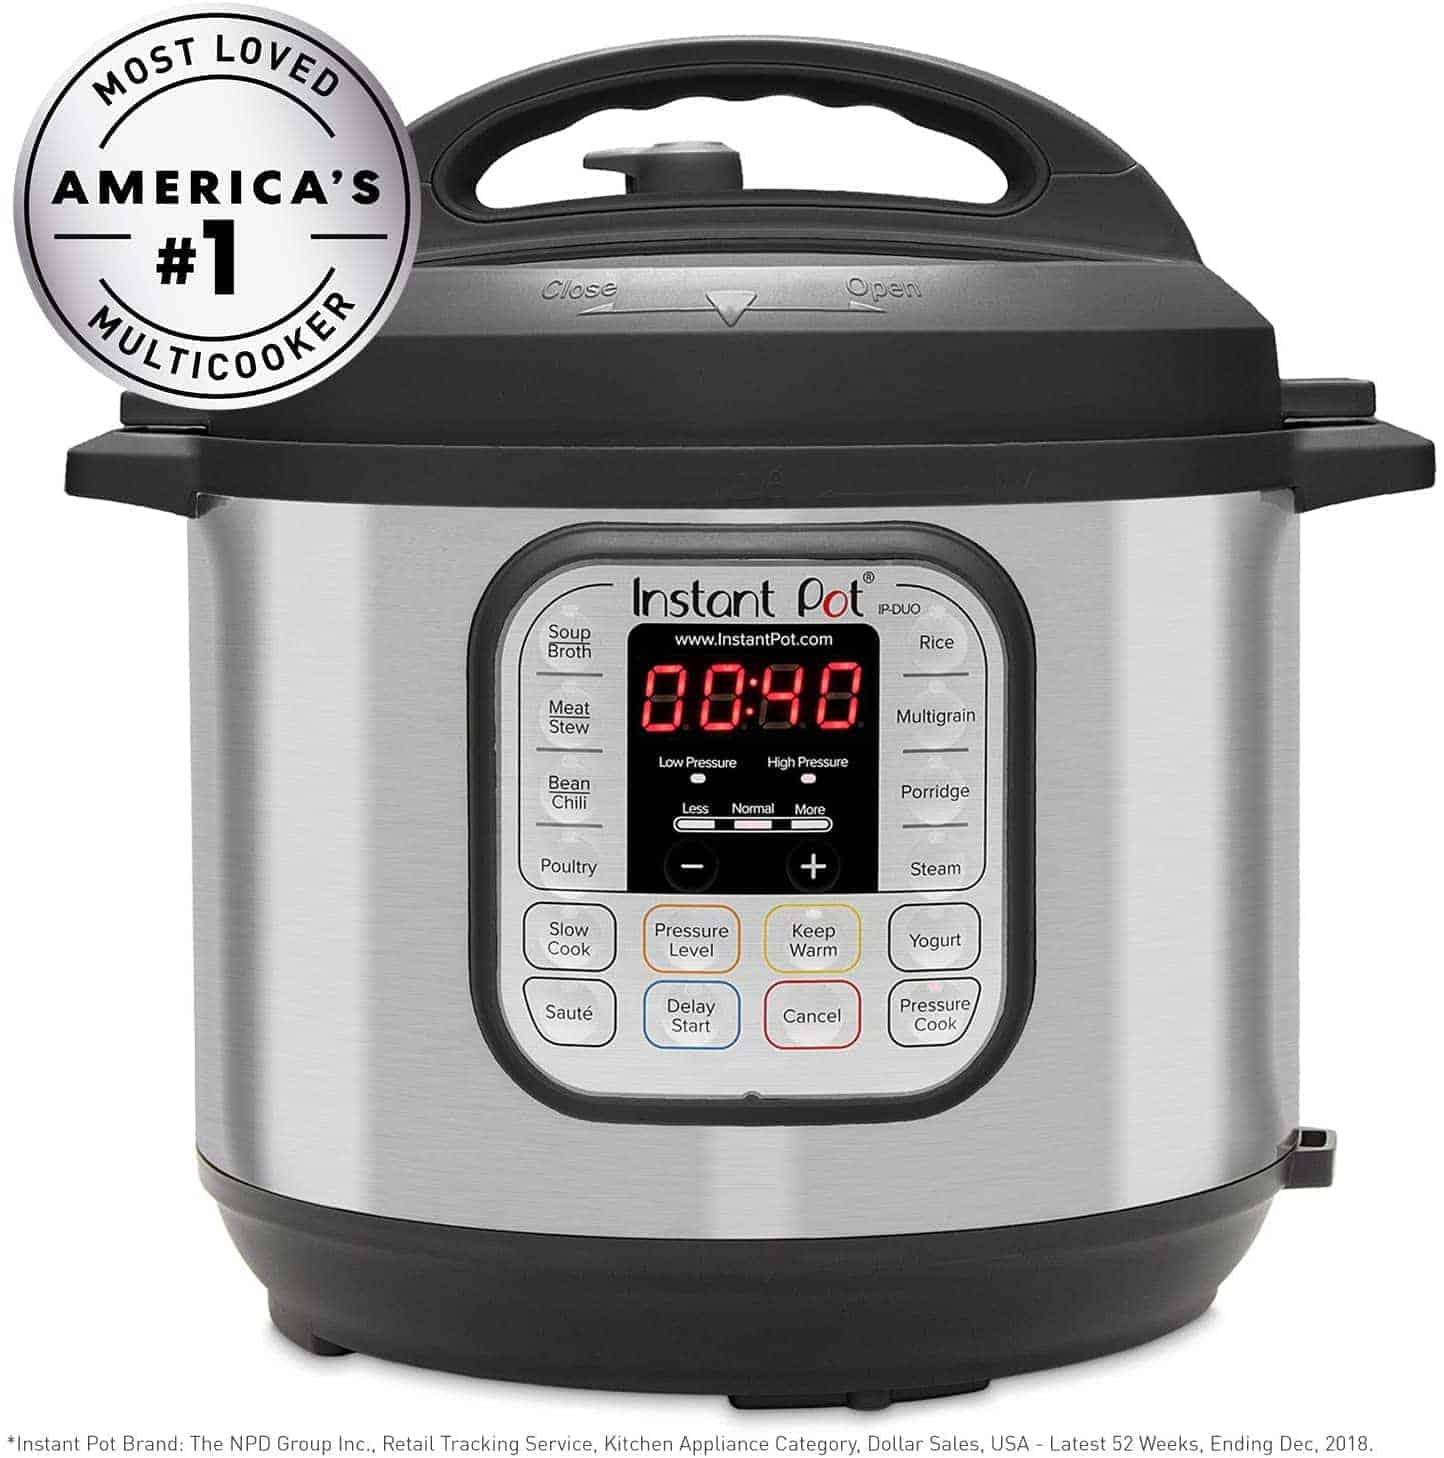 Instant Pot Duo 7-in-1 Multi-Purpose Cooker